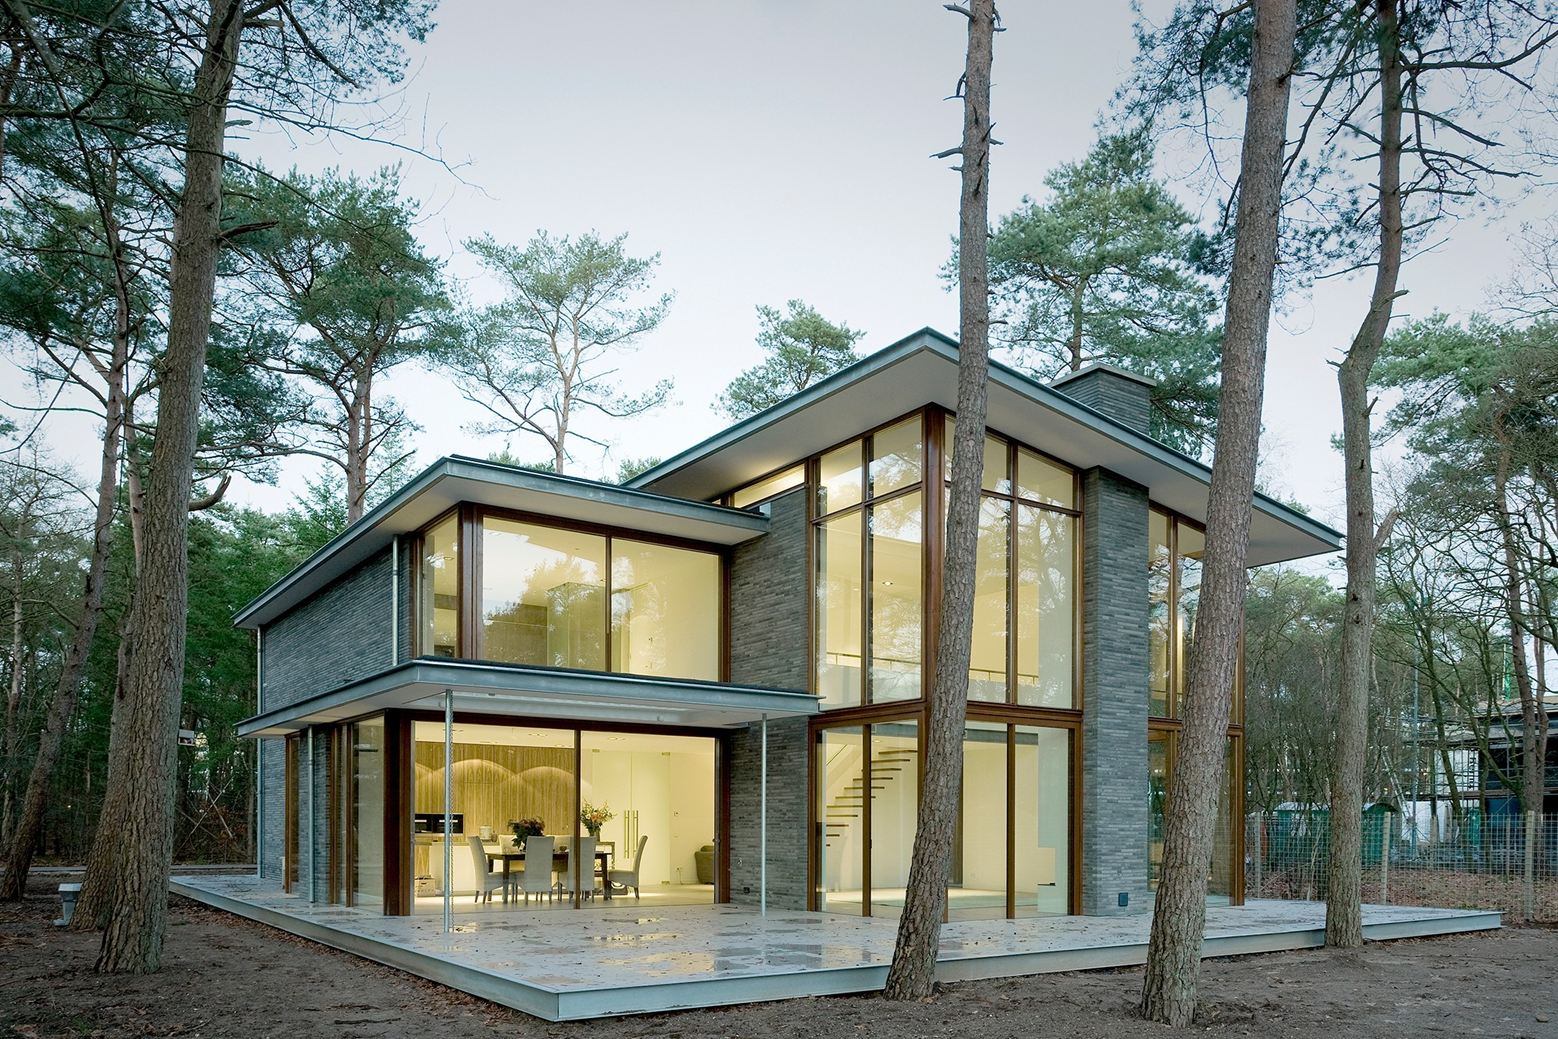 Villa Kerckebosch in Zeist, Netherlands by Engel Achitecten